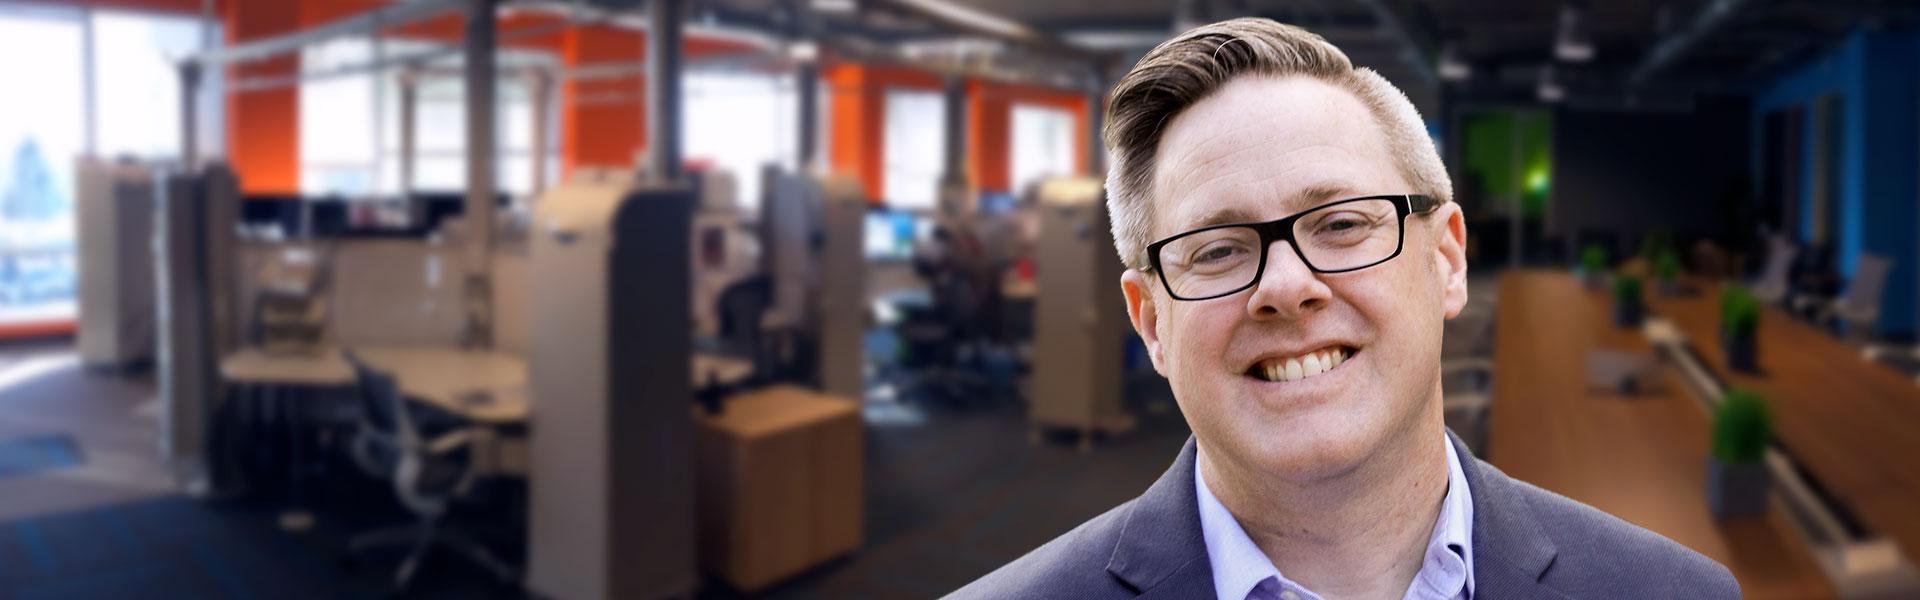 Brent Dykes - Senior Director, Insights & Data Storytelling